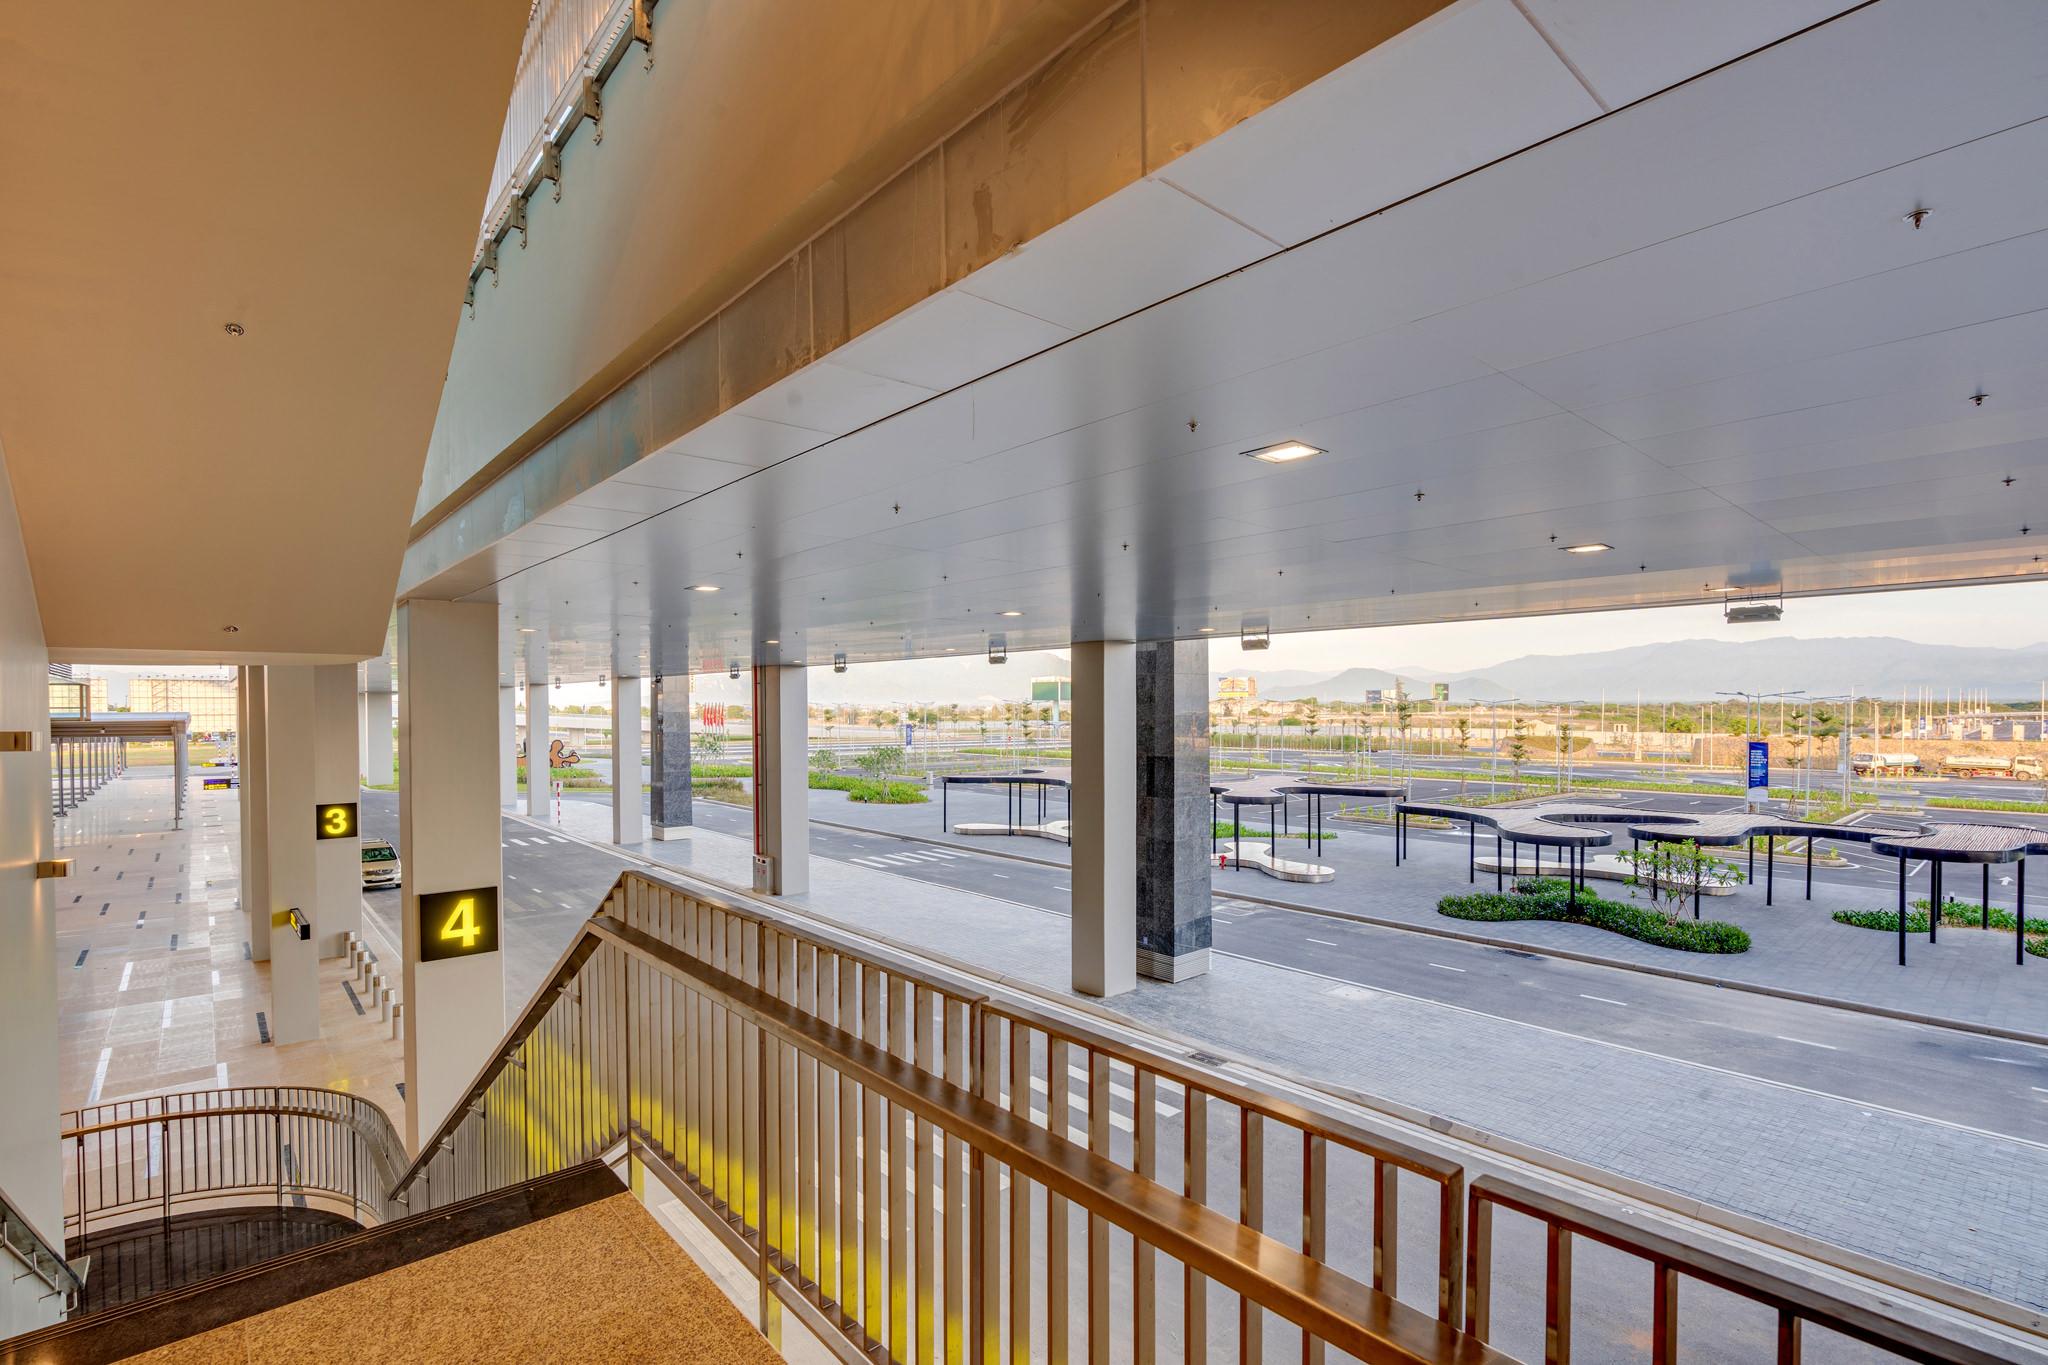 20180626 - Cam Ranh Airport - Architecture - 0043.jpg